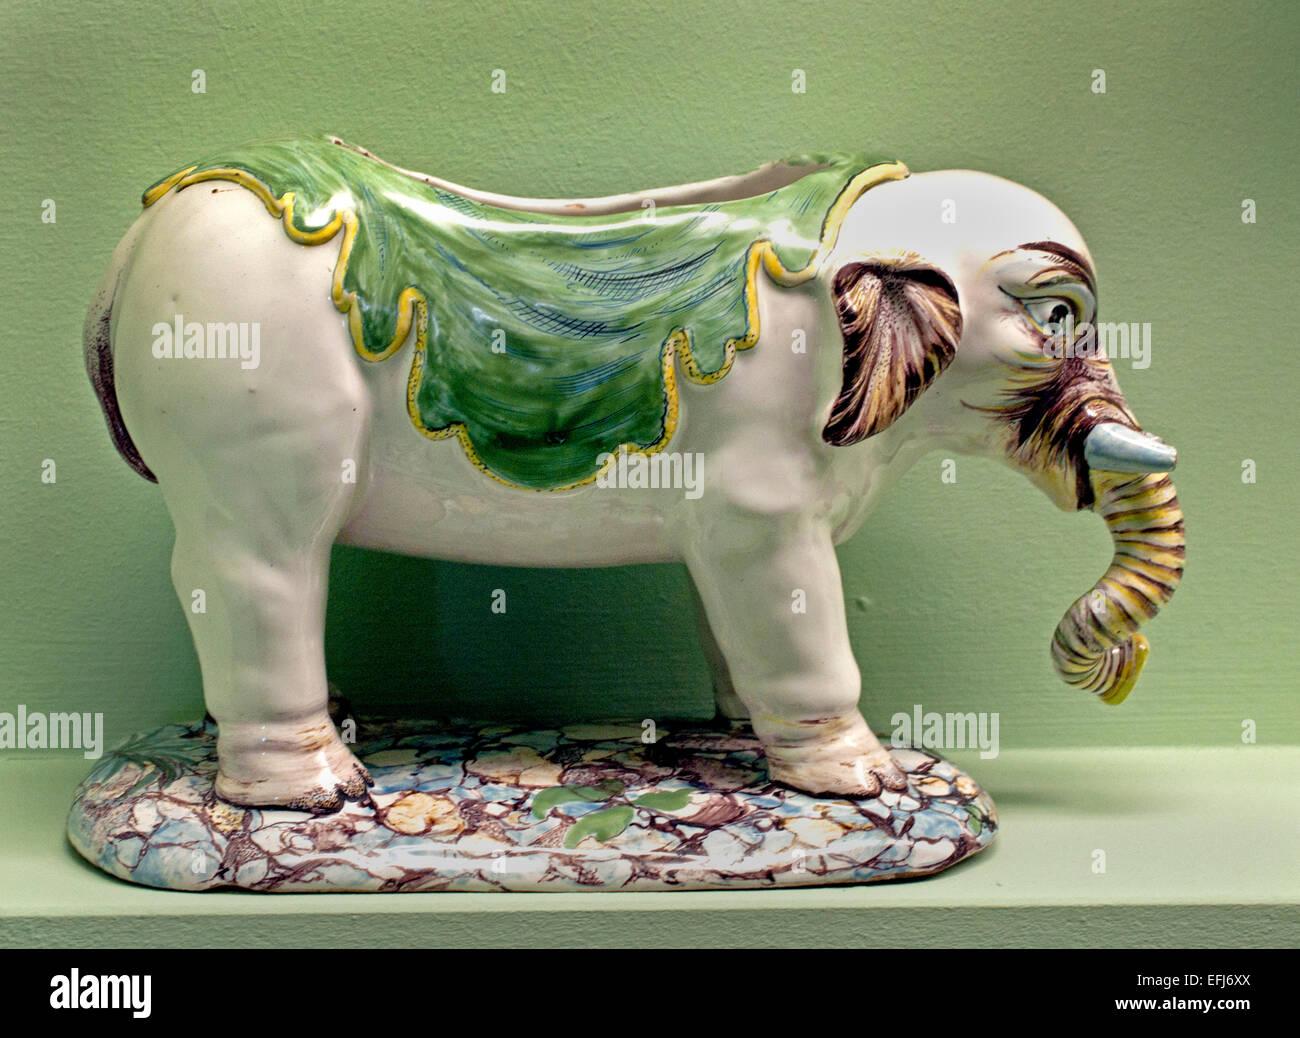 Porcelain Elephant Stock Photos & Porcelain Elephant Stock